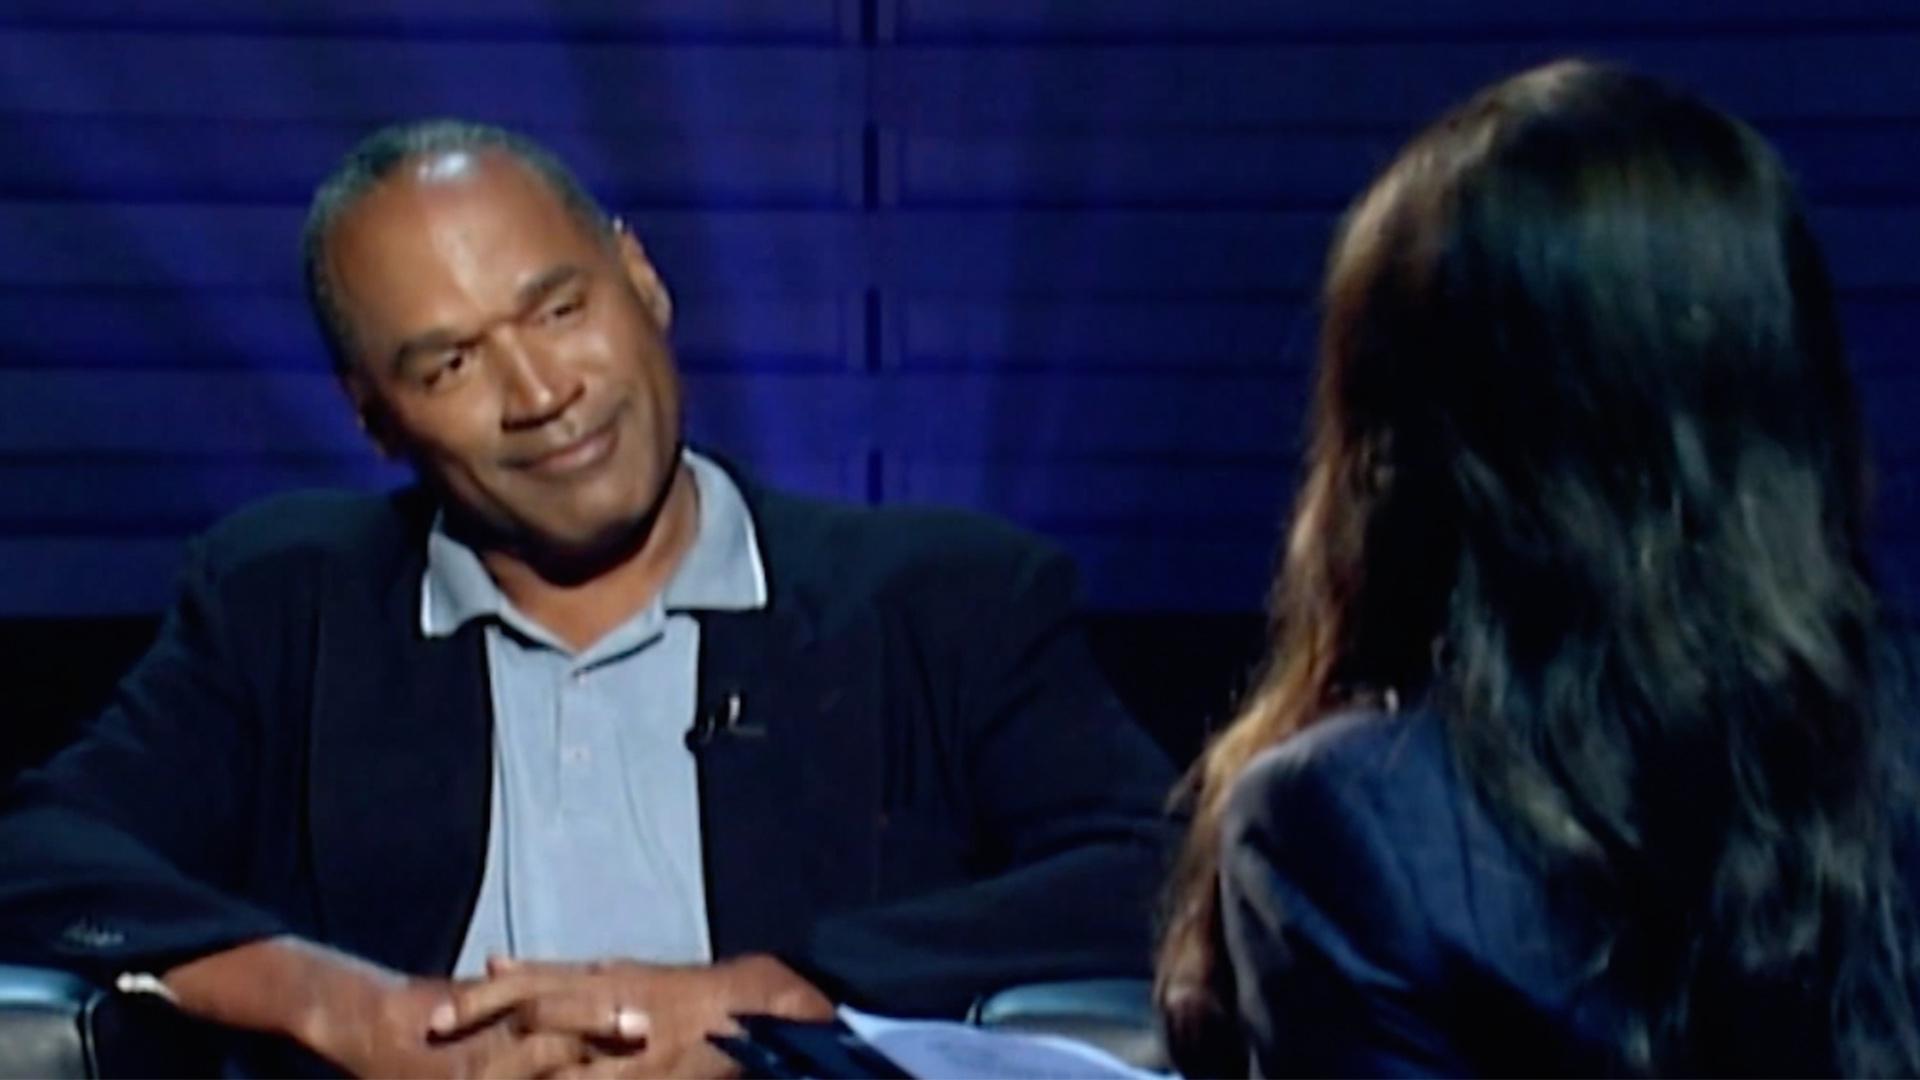 Desus and Mero Break Down That Old O.J. Simpson Interview